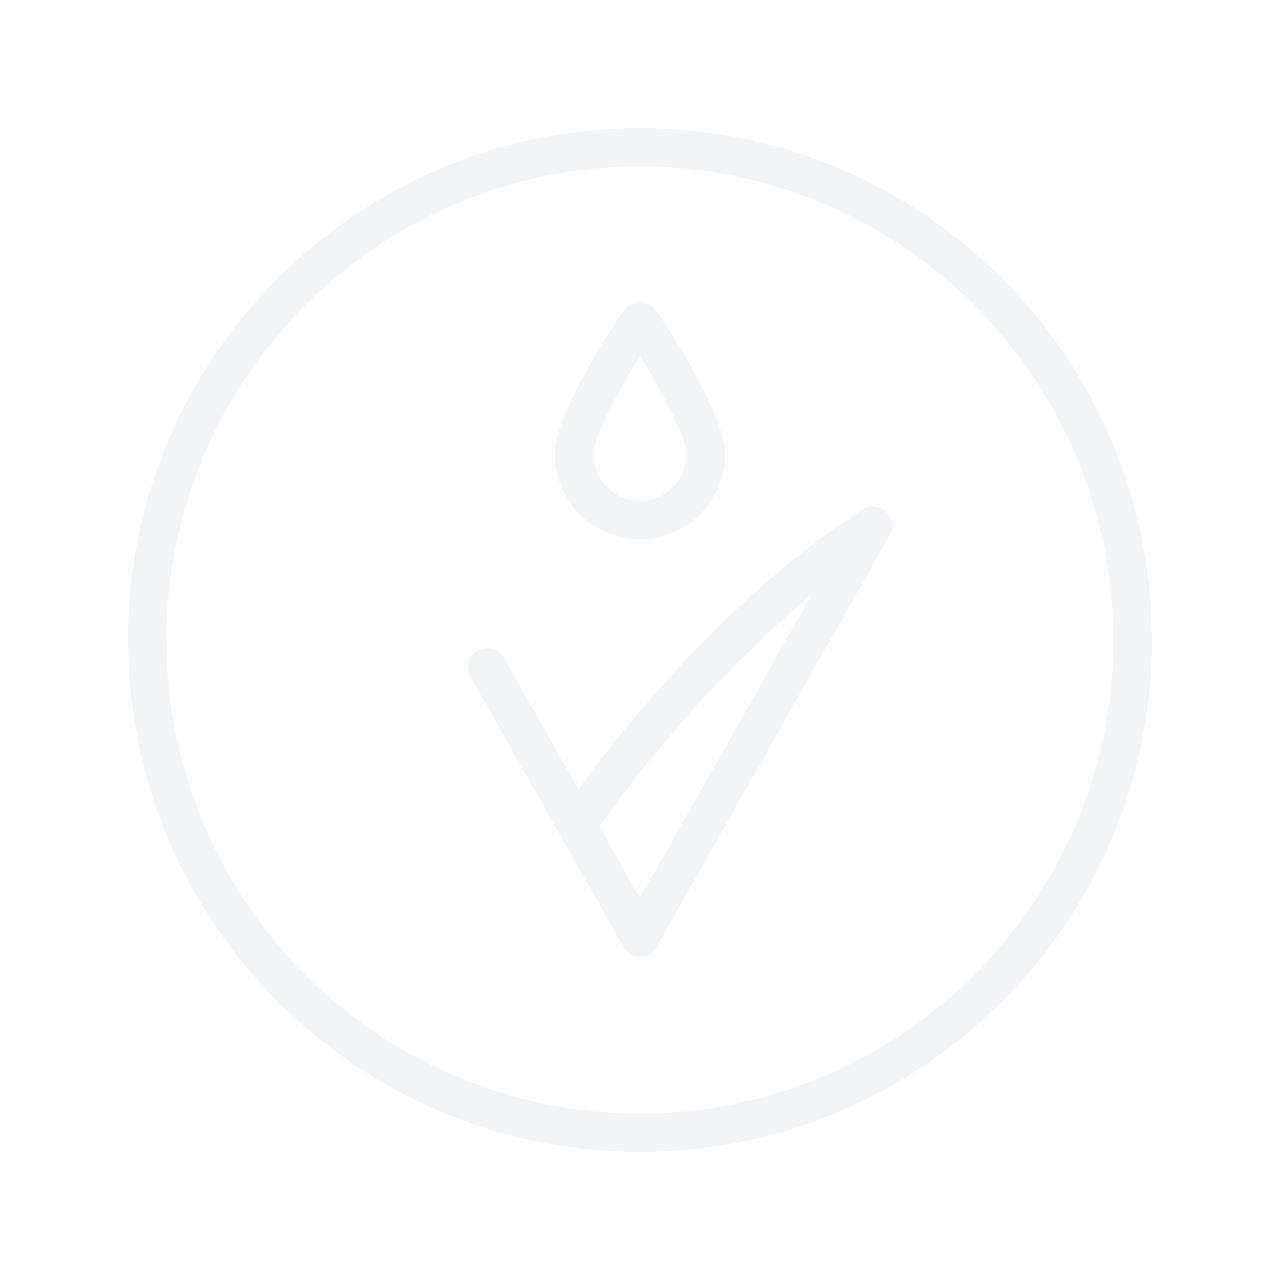 Collistar Body Multi-Active Deodorant 24 Hours Cream 75ml